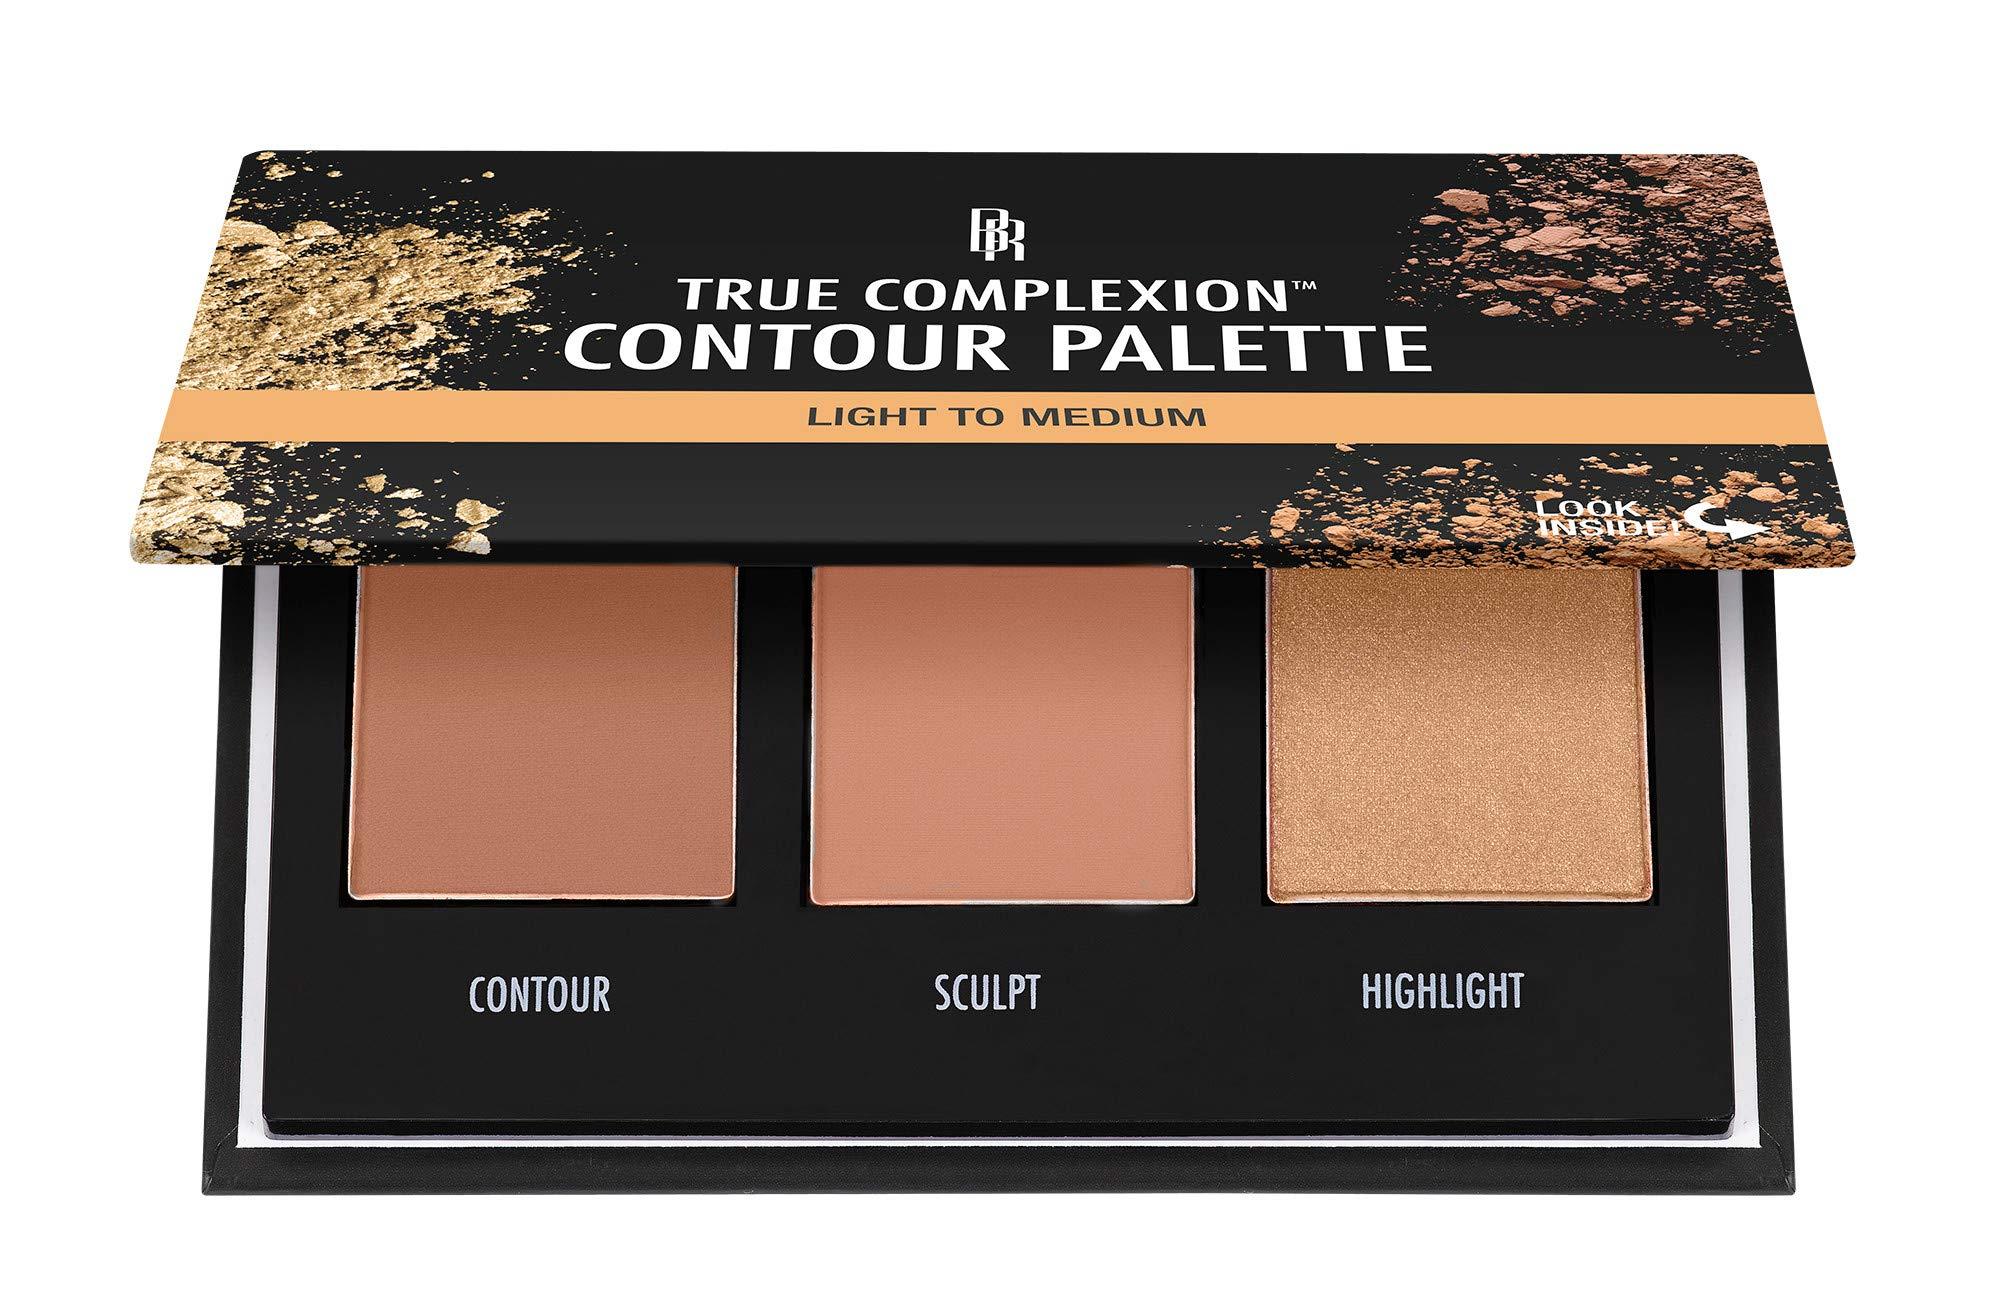 Black Radiance True Complexion Contour Palette, Light to Medium, 0.38 Ounce